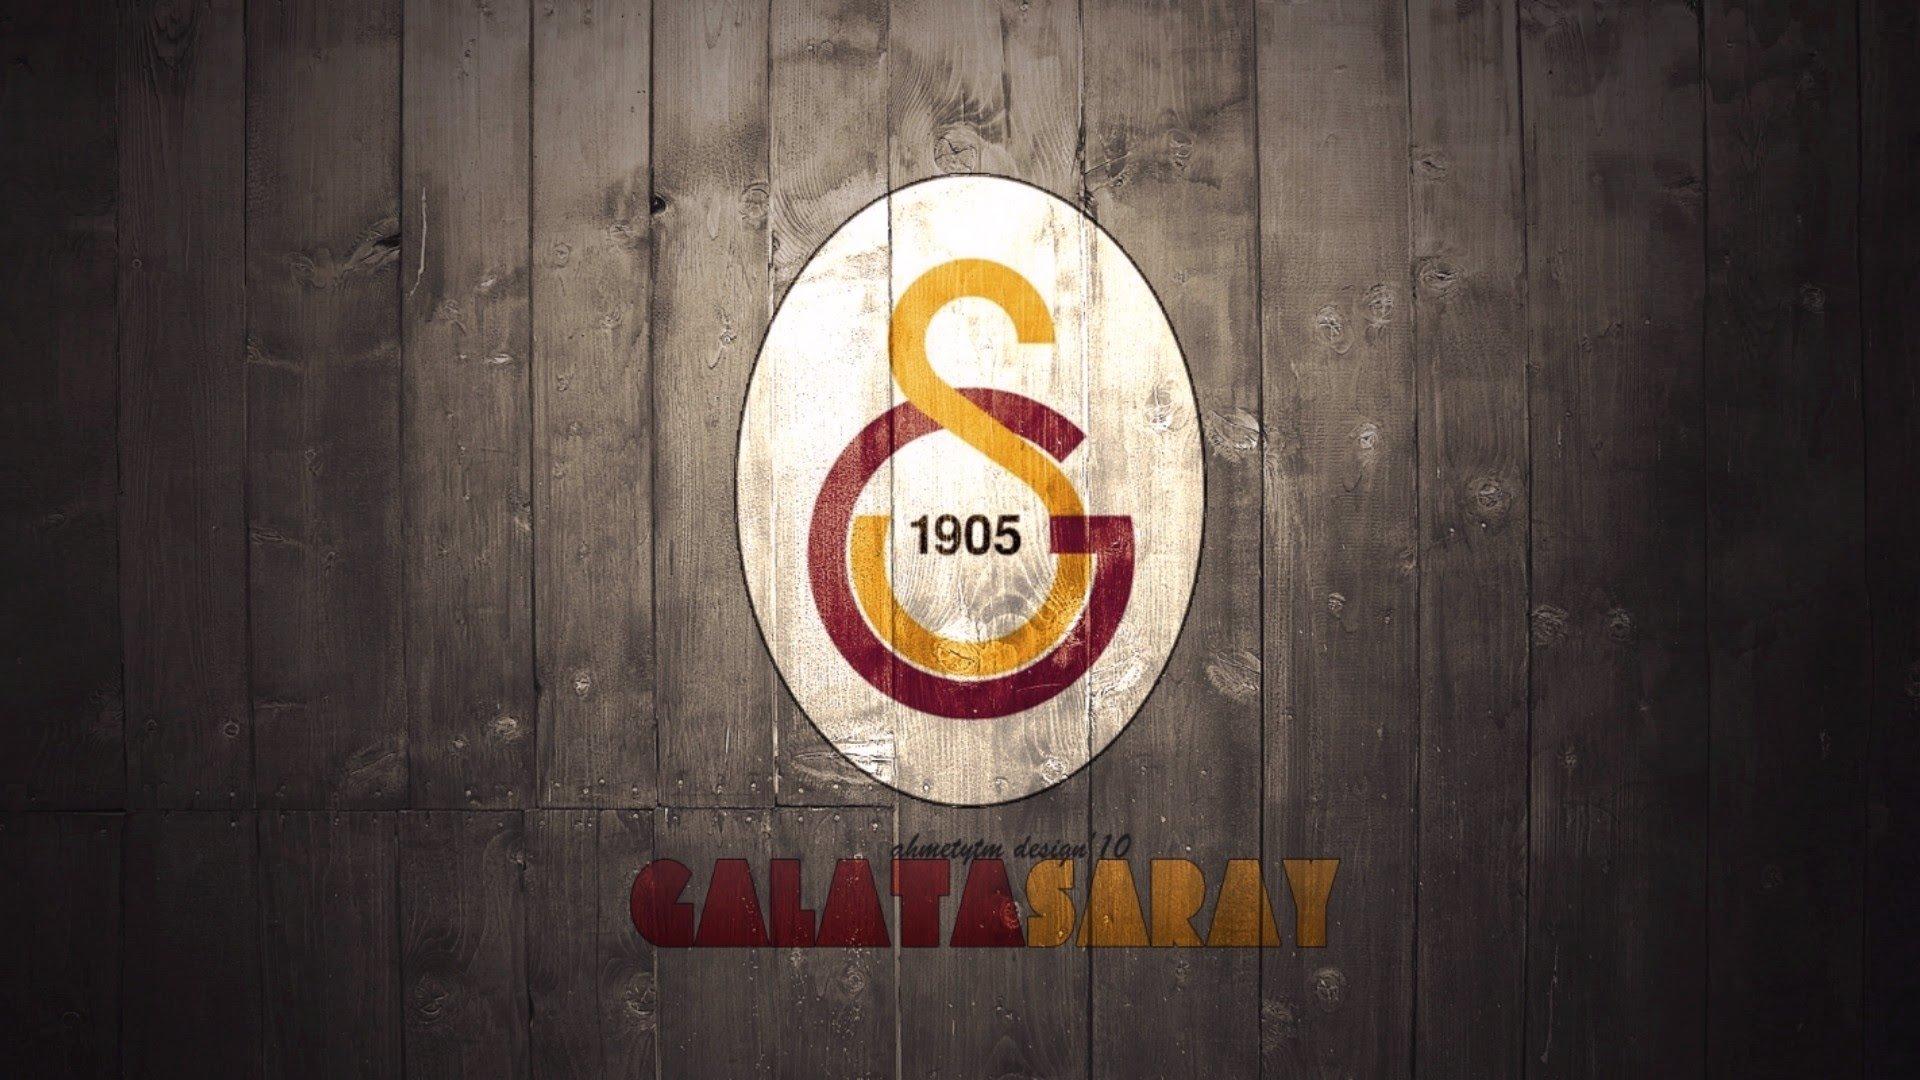 Galatasaray Amblem Teknocard